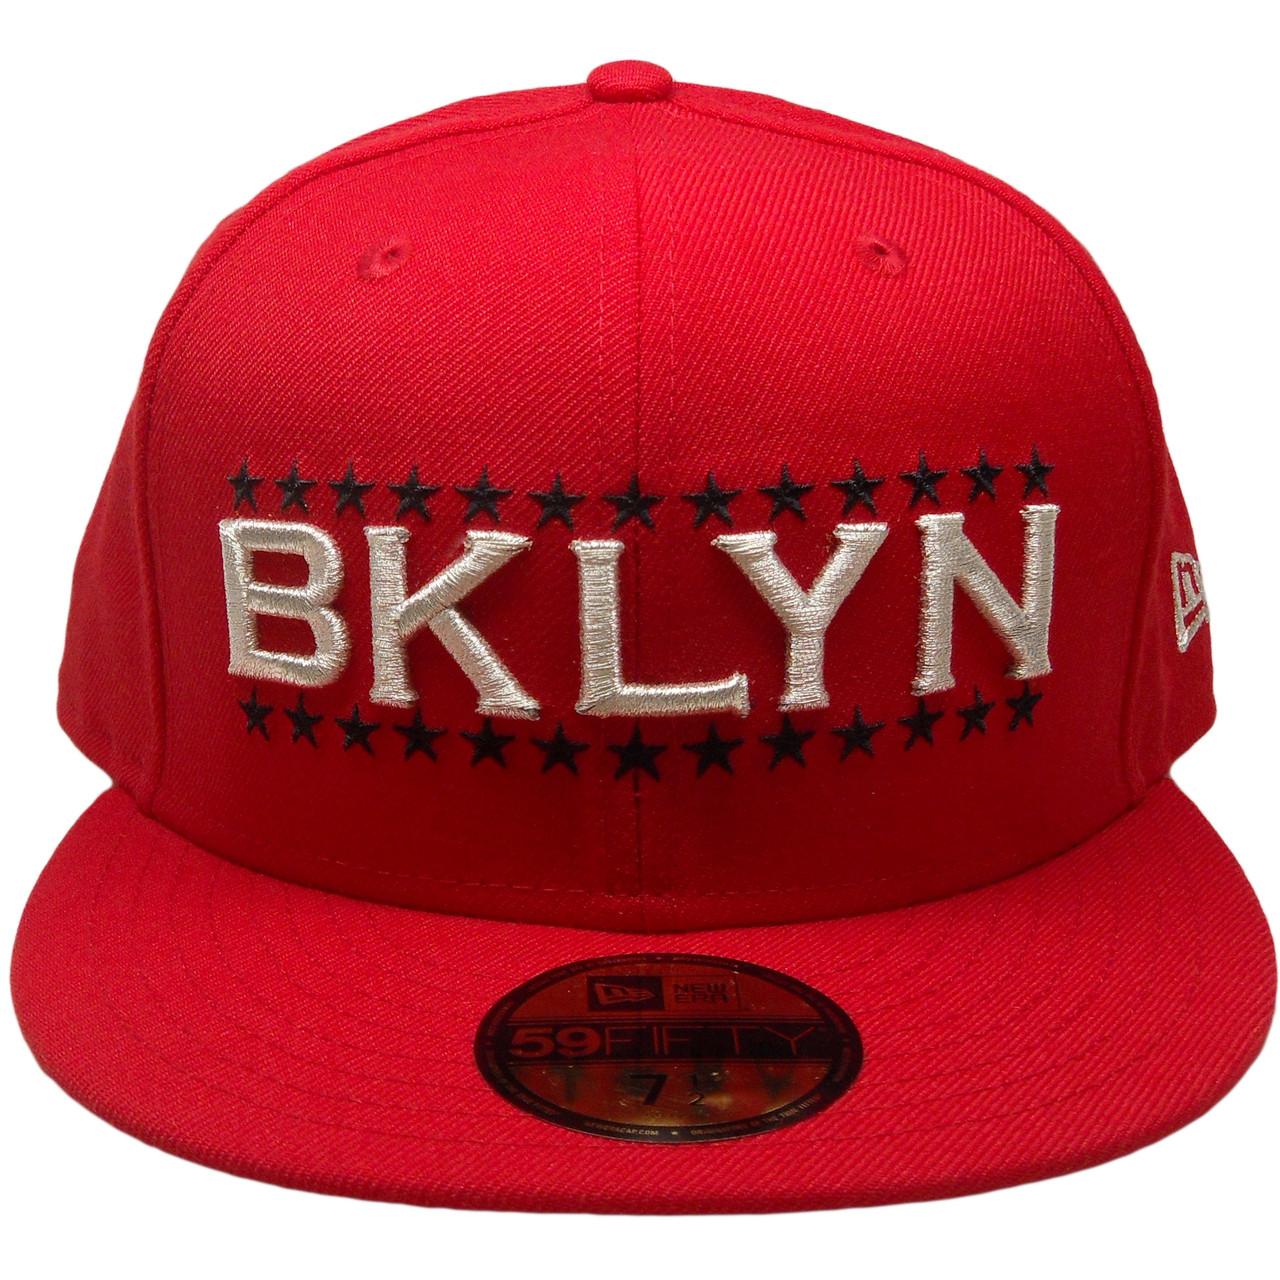 Brooklyn Custom New Era 59Fifty Fitted - Red aa08c1bda61